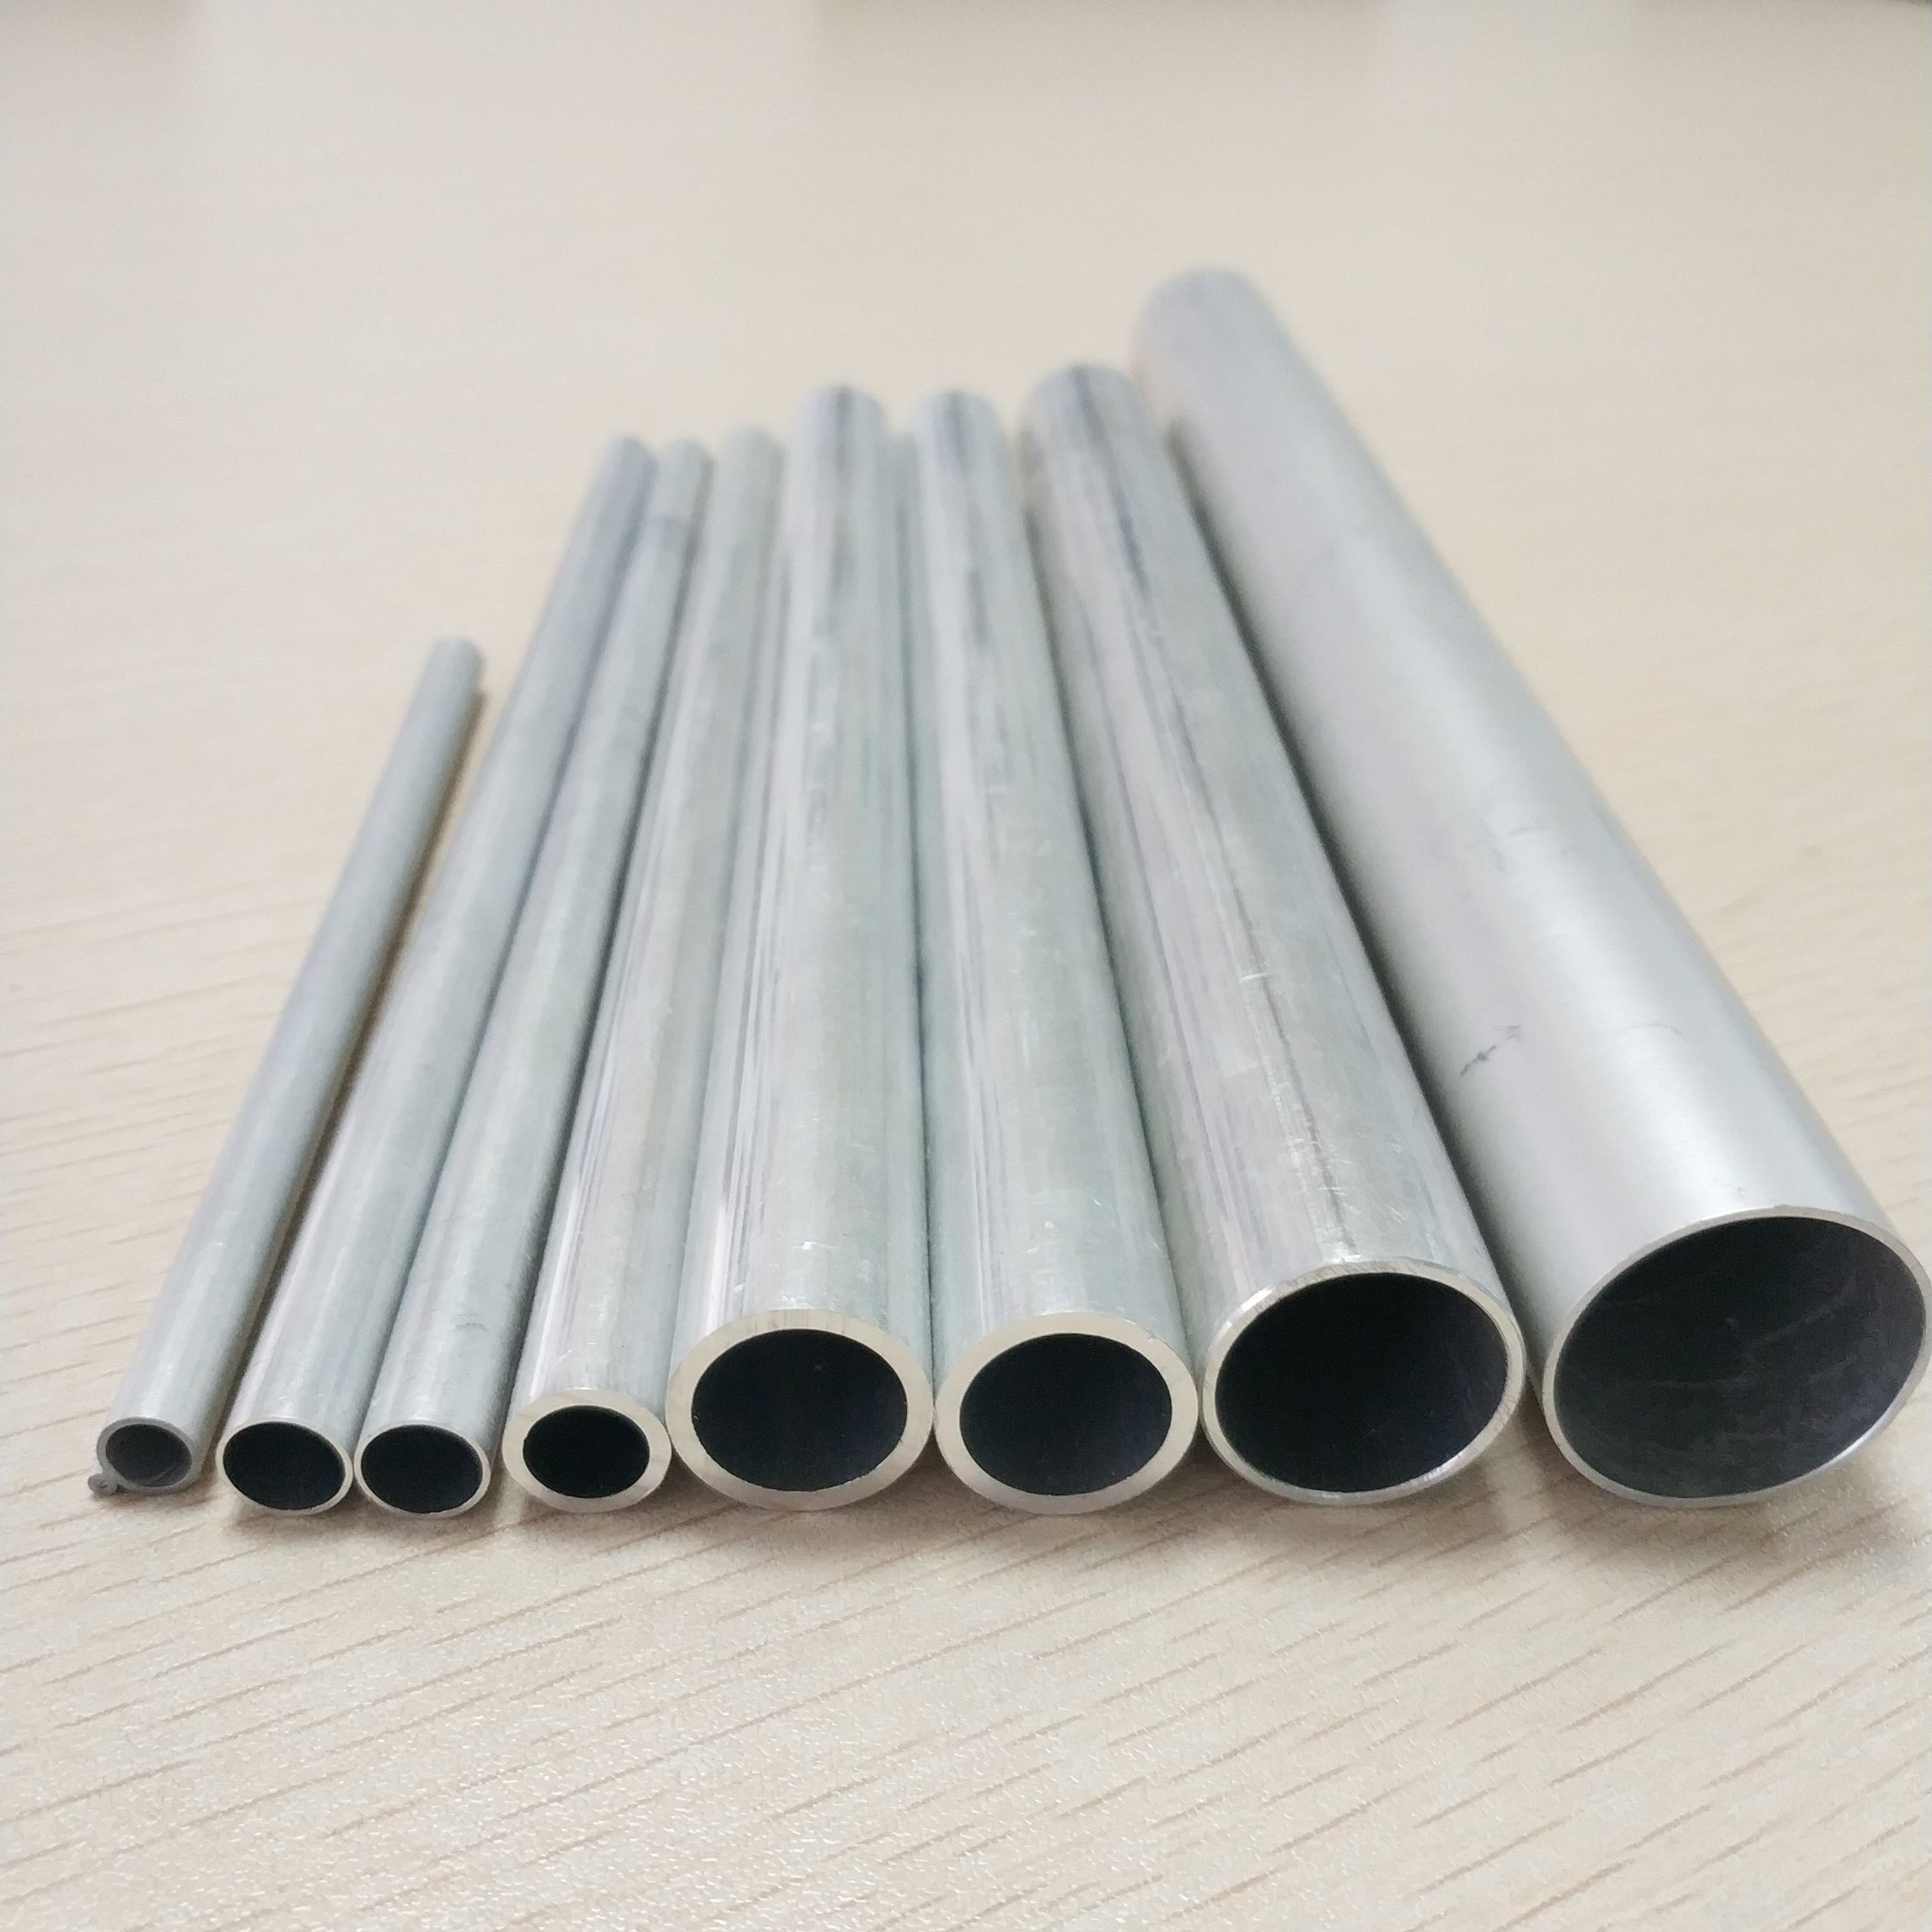 aluminum coil price per kg aluminum coil for gutters 3 aluminum voice coil